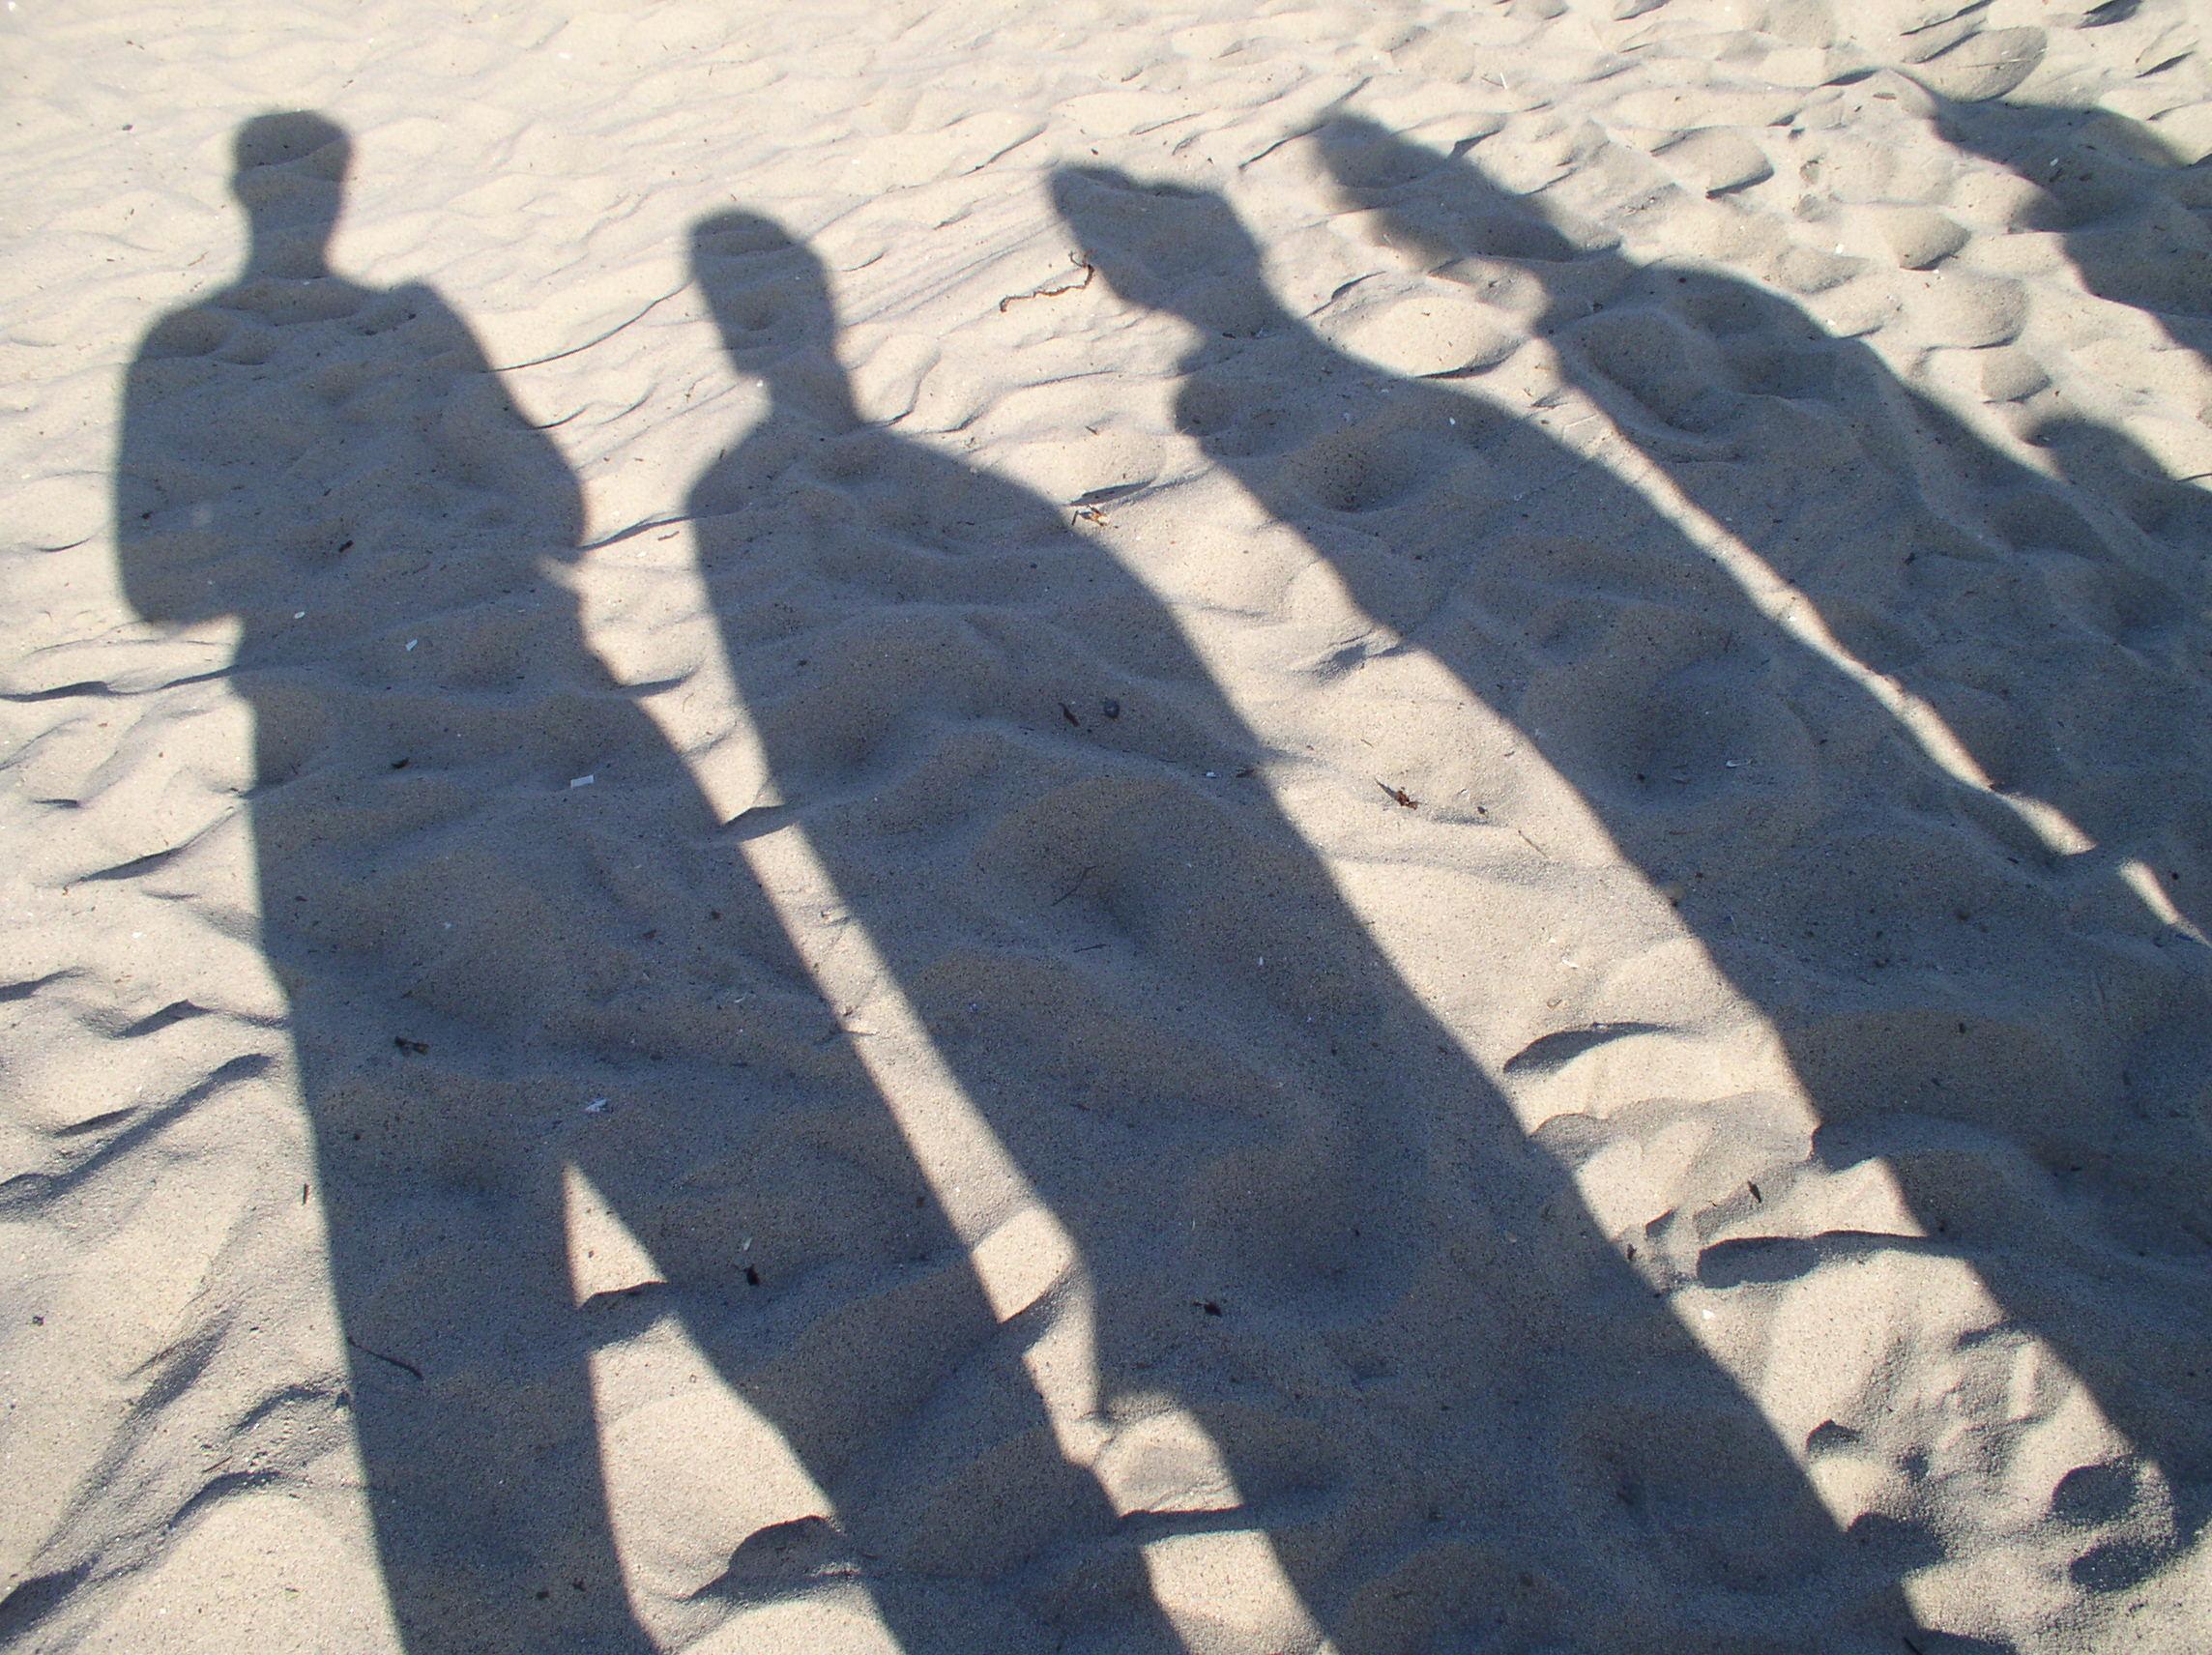 File:People Shadow.JPG - Wikimedia Commons